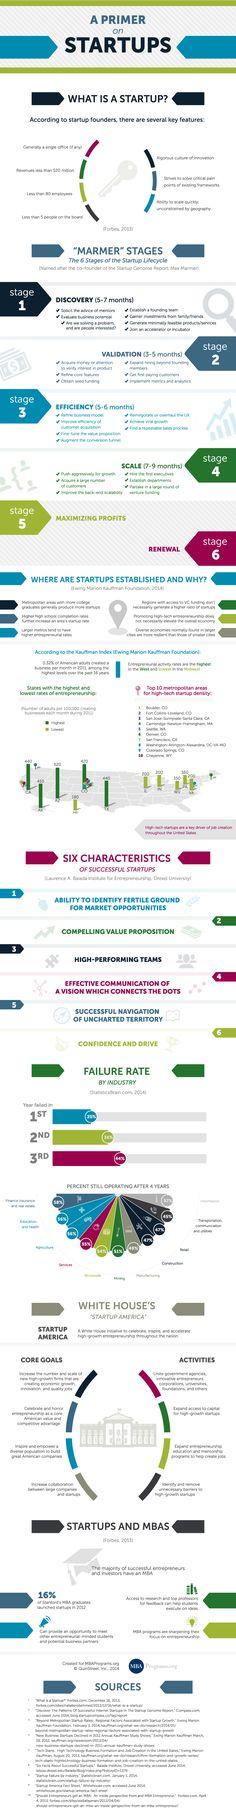 A Primer on Startups #infographic #Entrepreneur #Startup #Business http://www.manhattanstreetcapital.com/